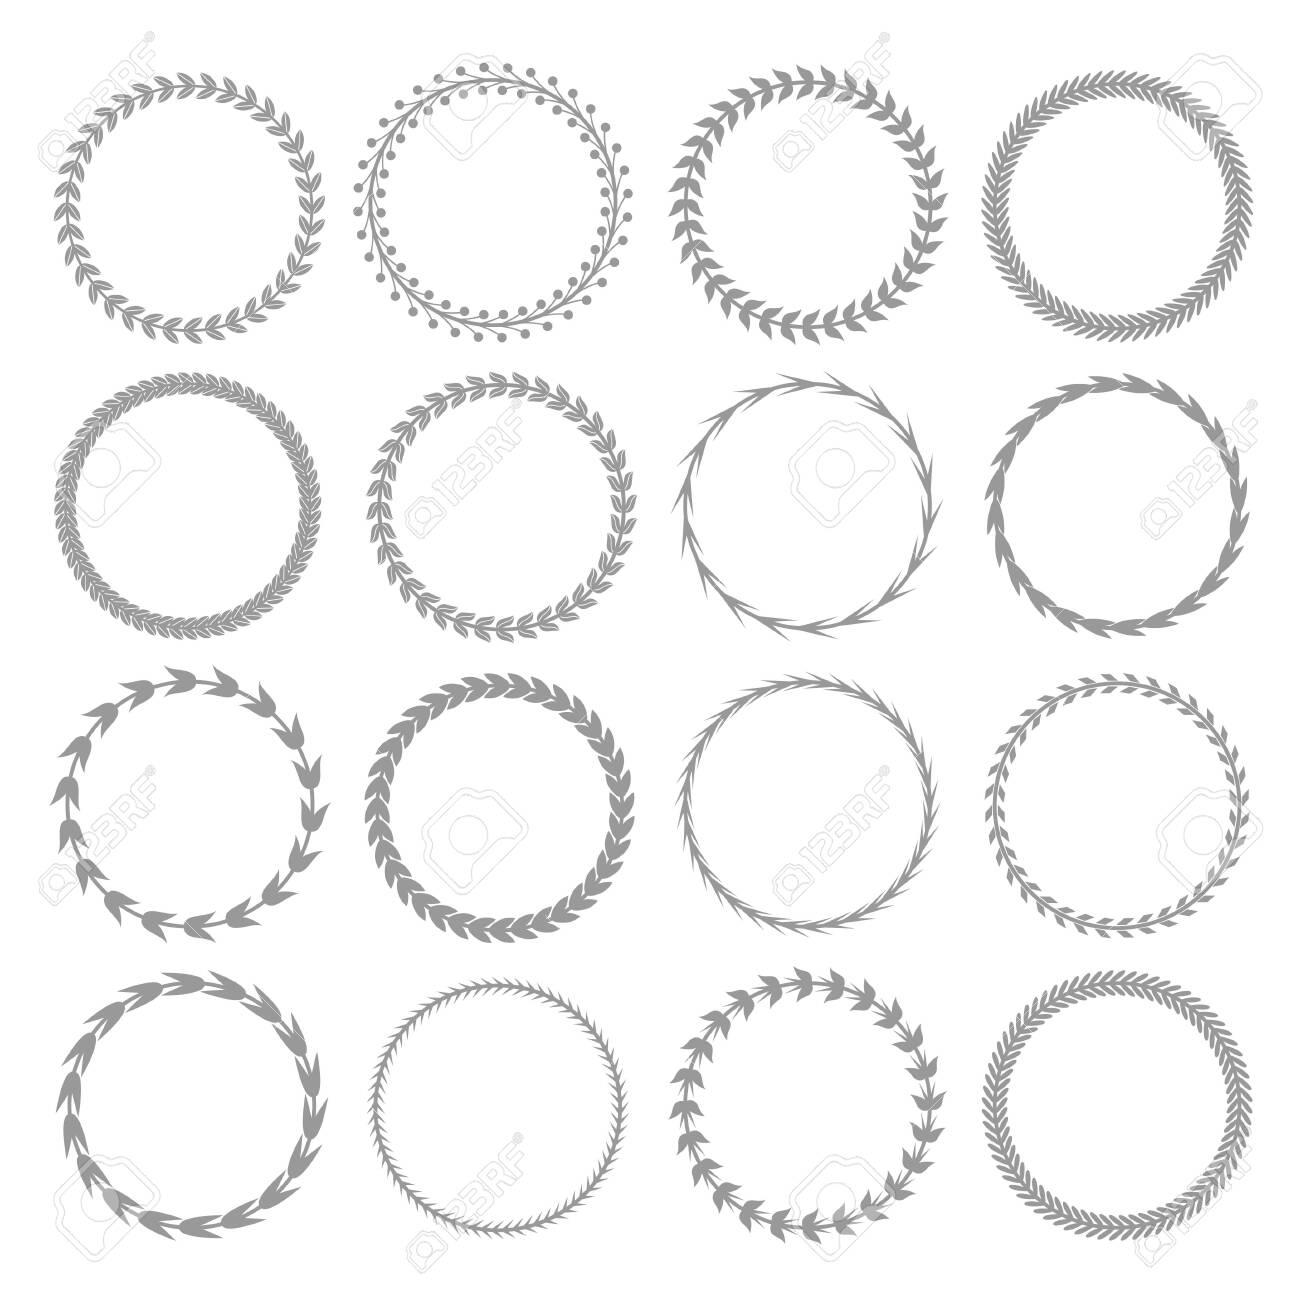 Laurel wreath label badge set isolated, Vector illustration - 124139105